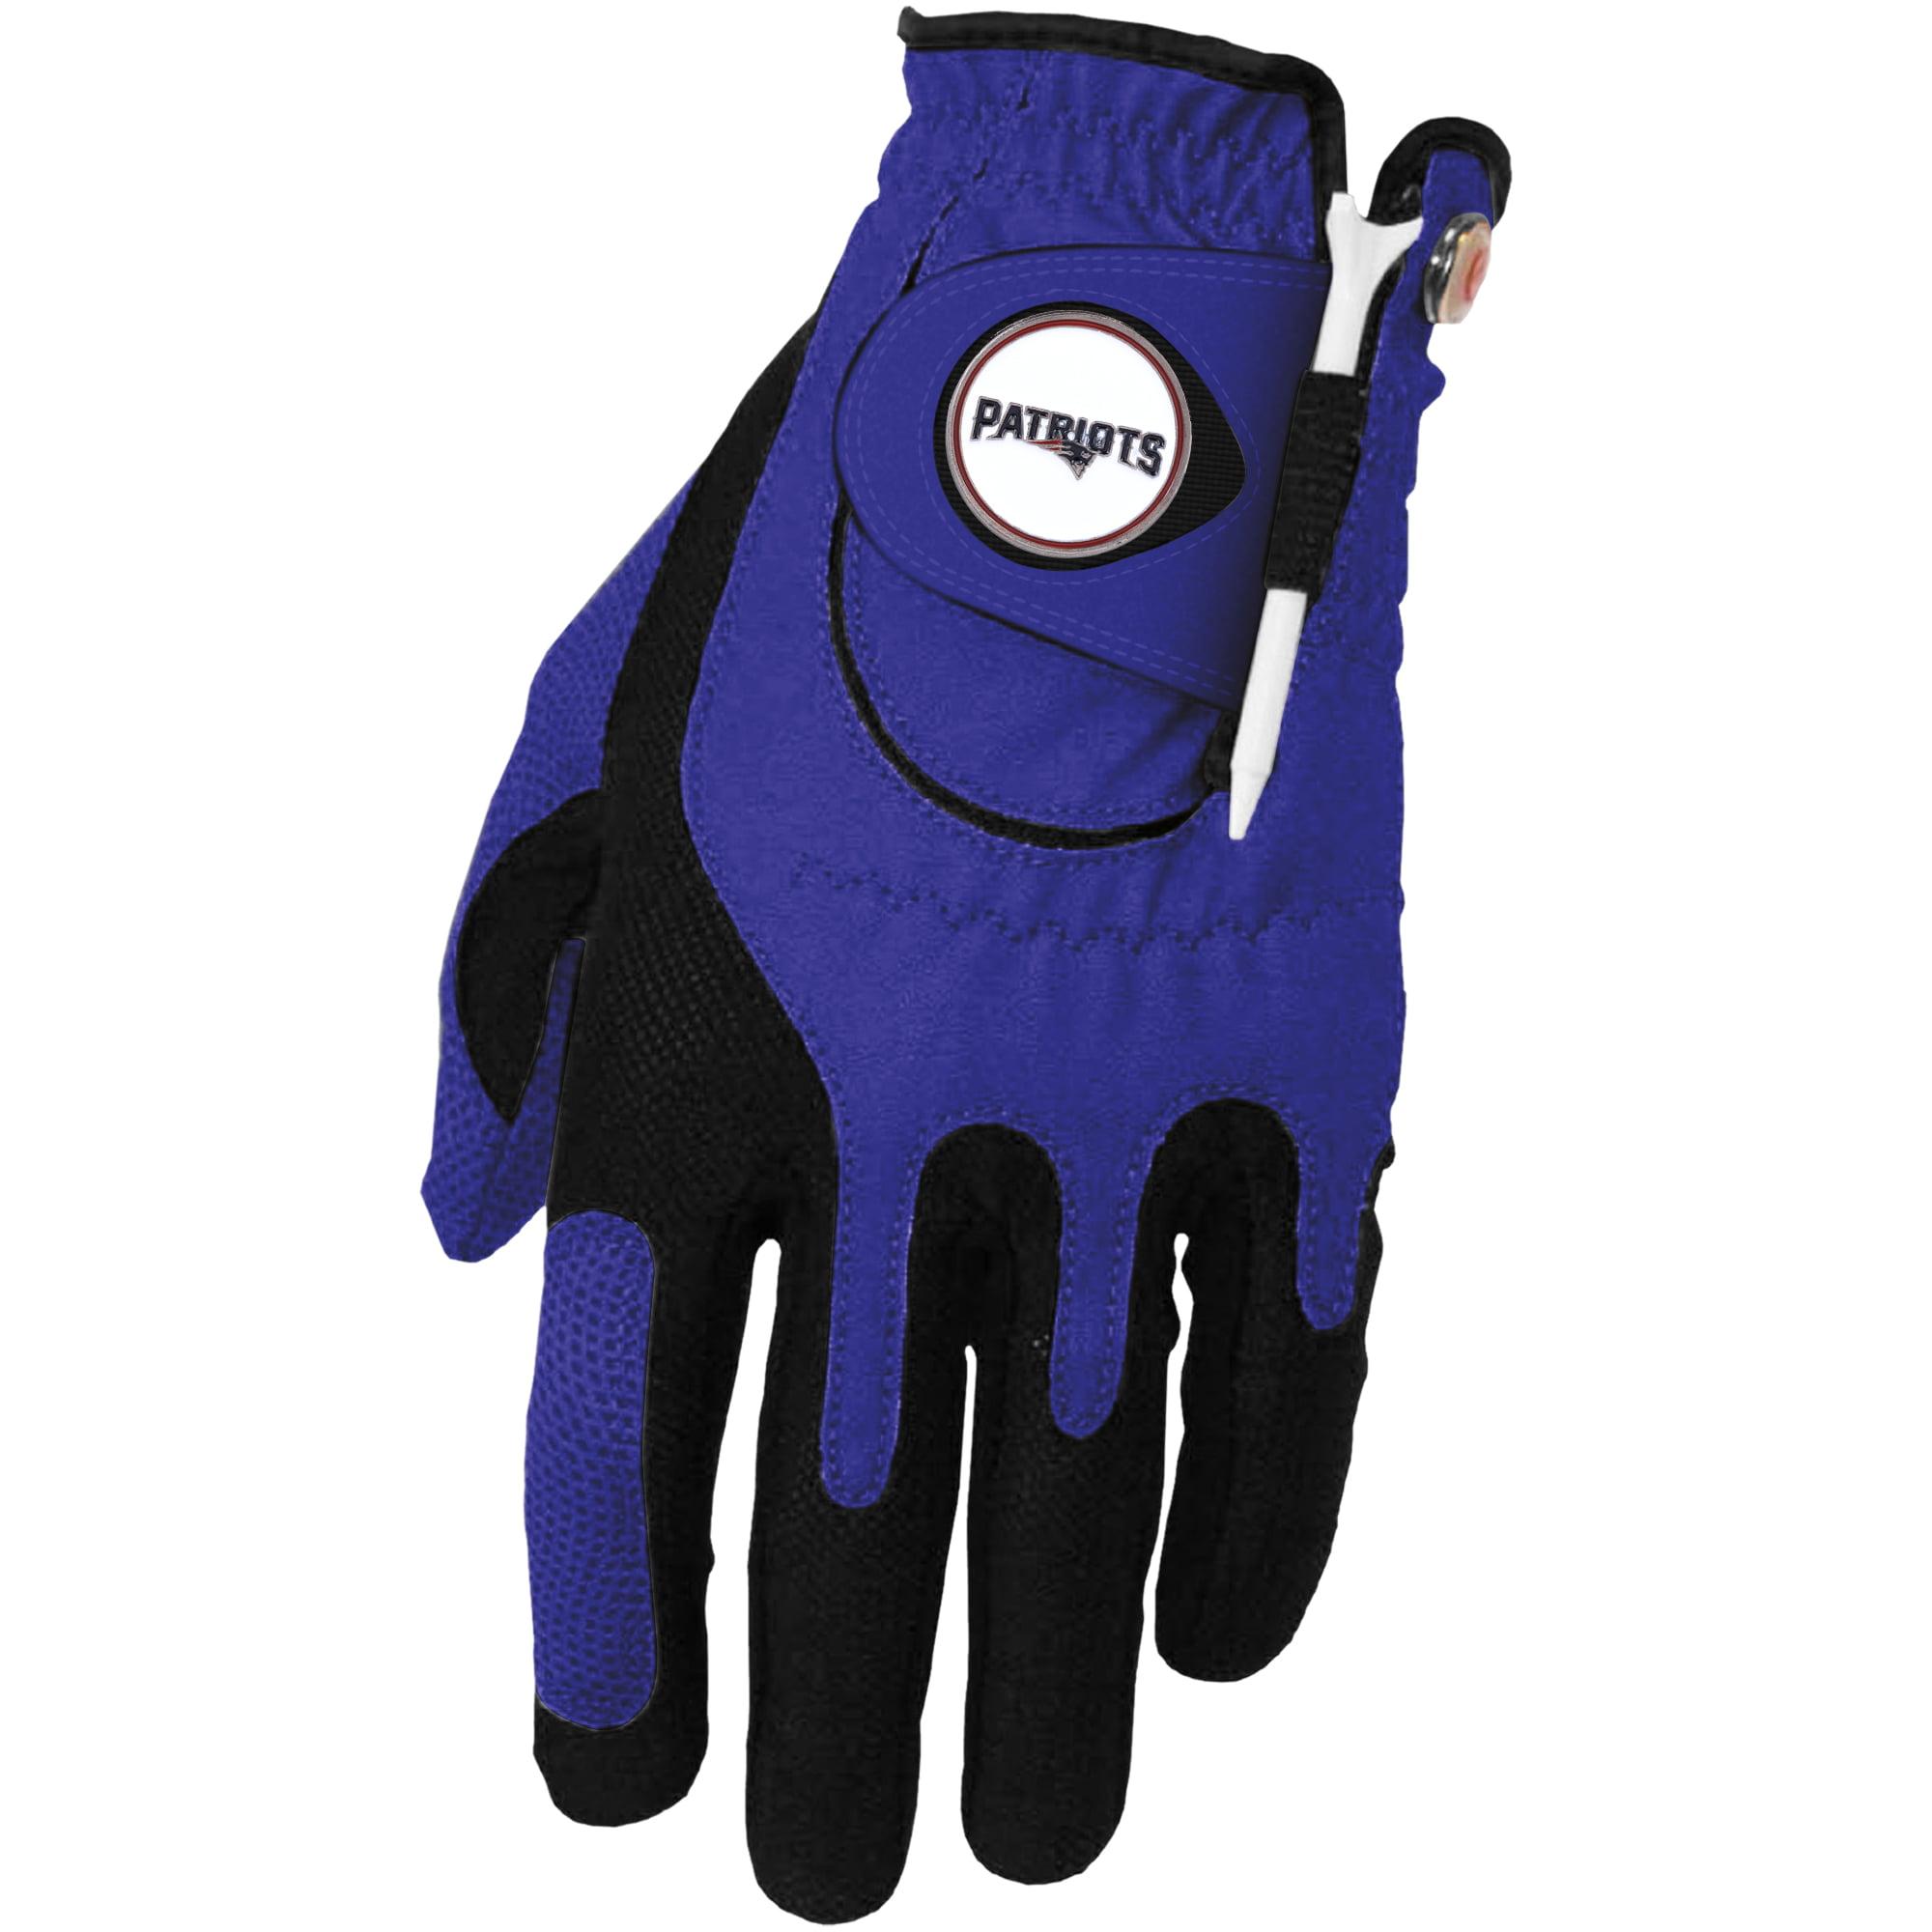 New England Patriots Left Hand Golf Glove & Ball Marker Set - Blue - OSFM